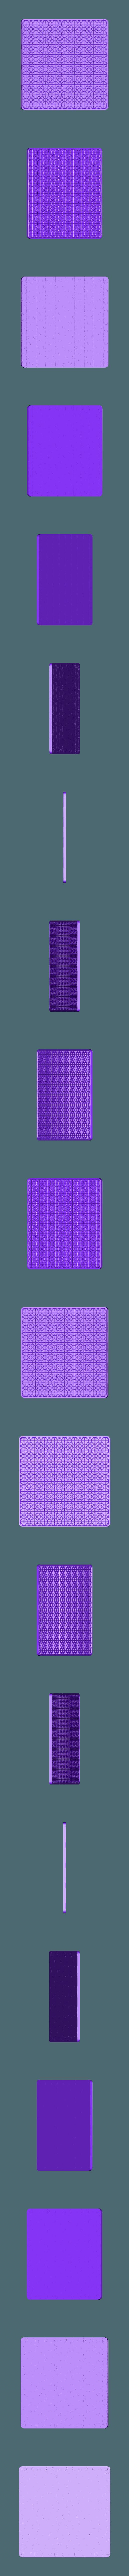 Tablero_completo.stl Download free STL file Tablero puzzle Bilbao • Model to 3D print, alexanderegido